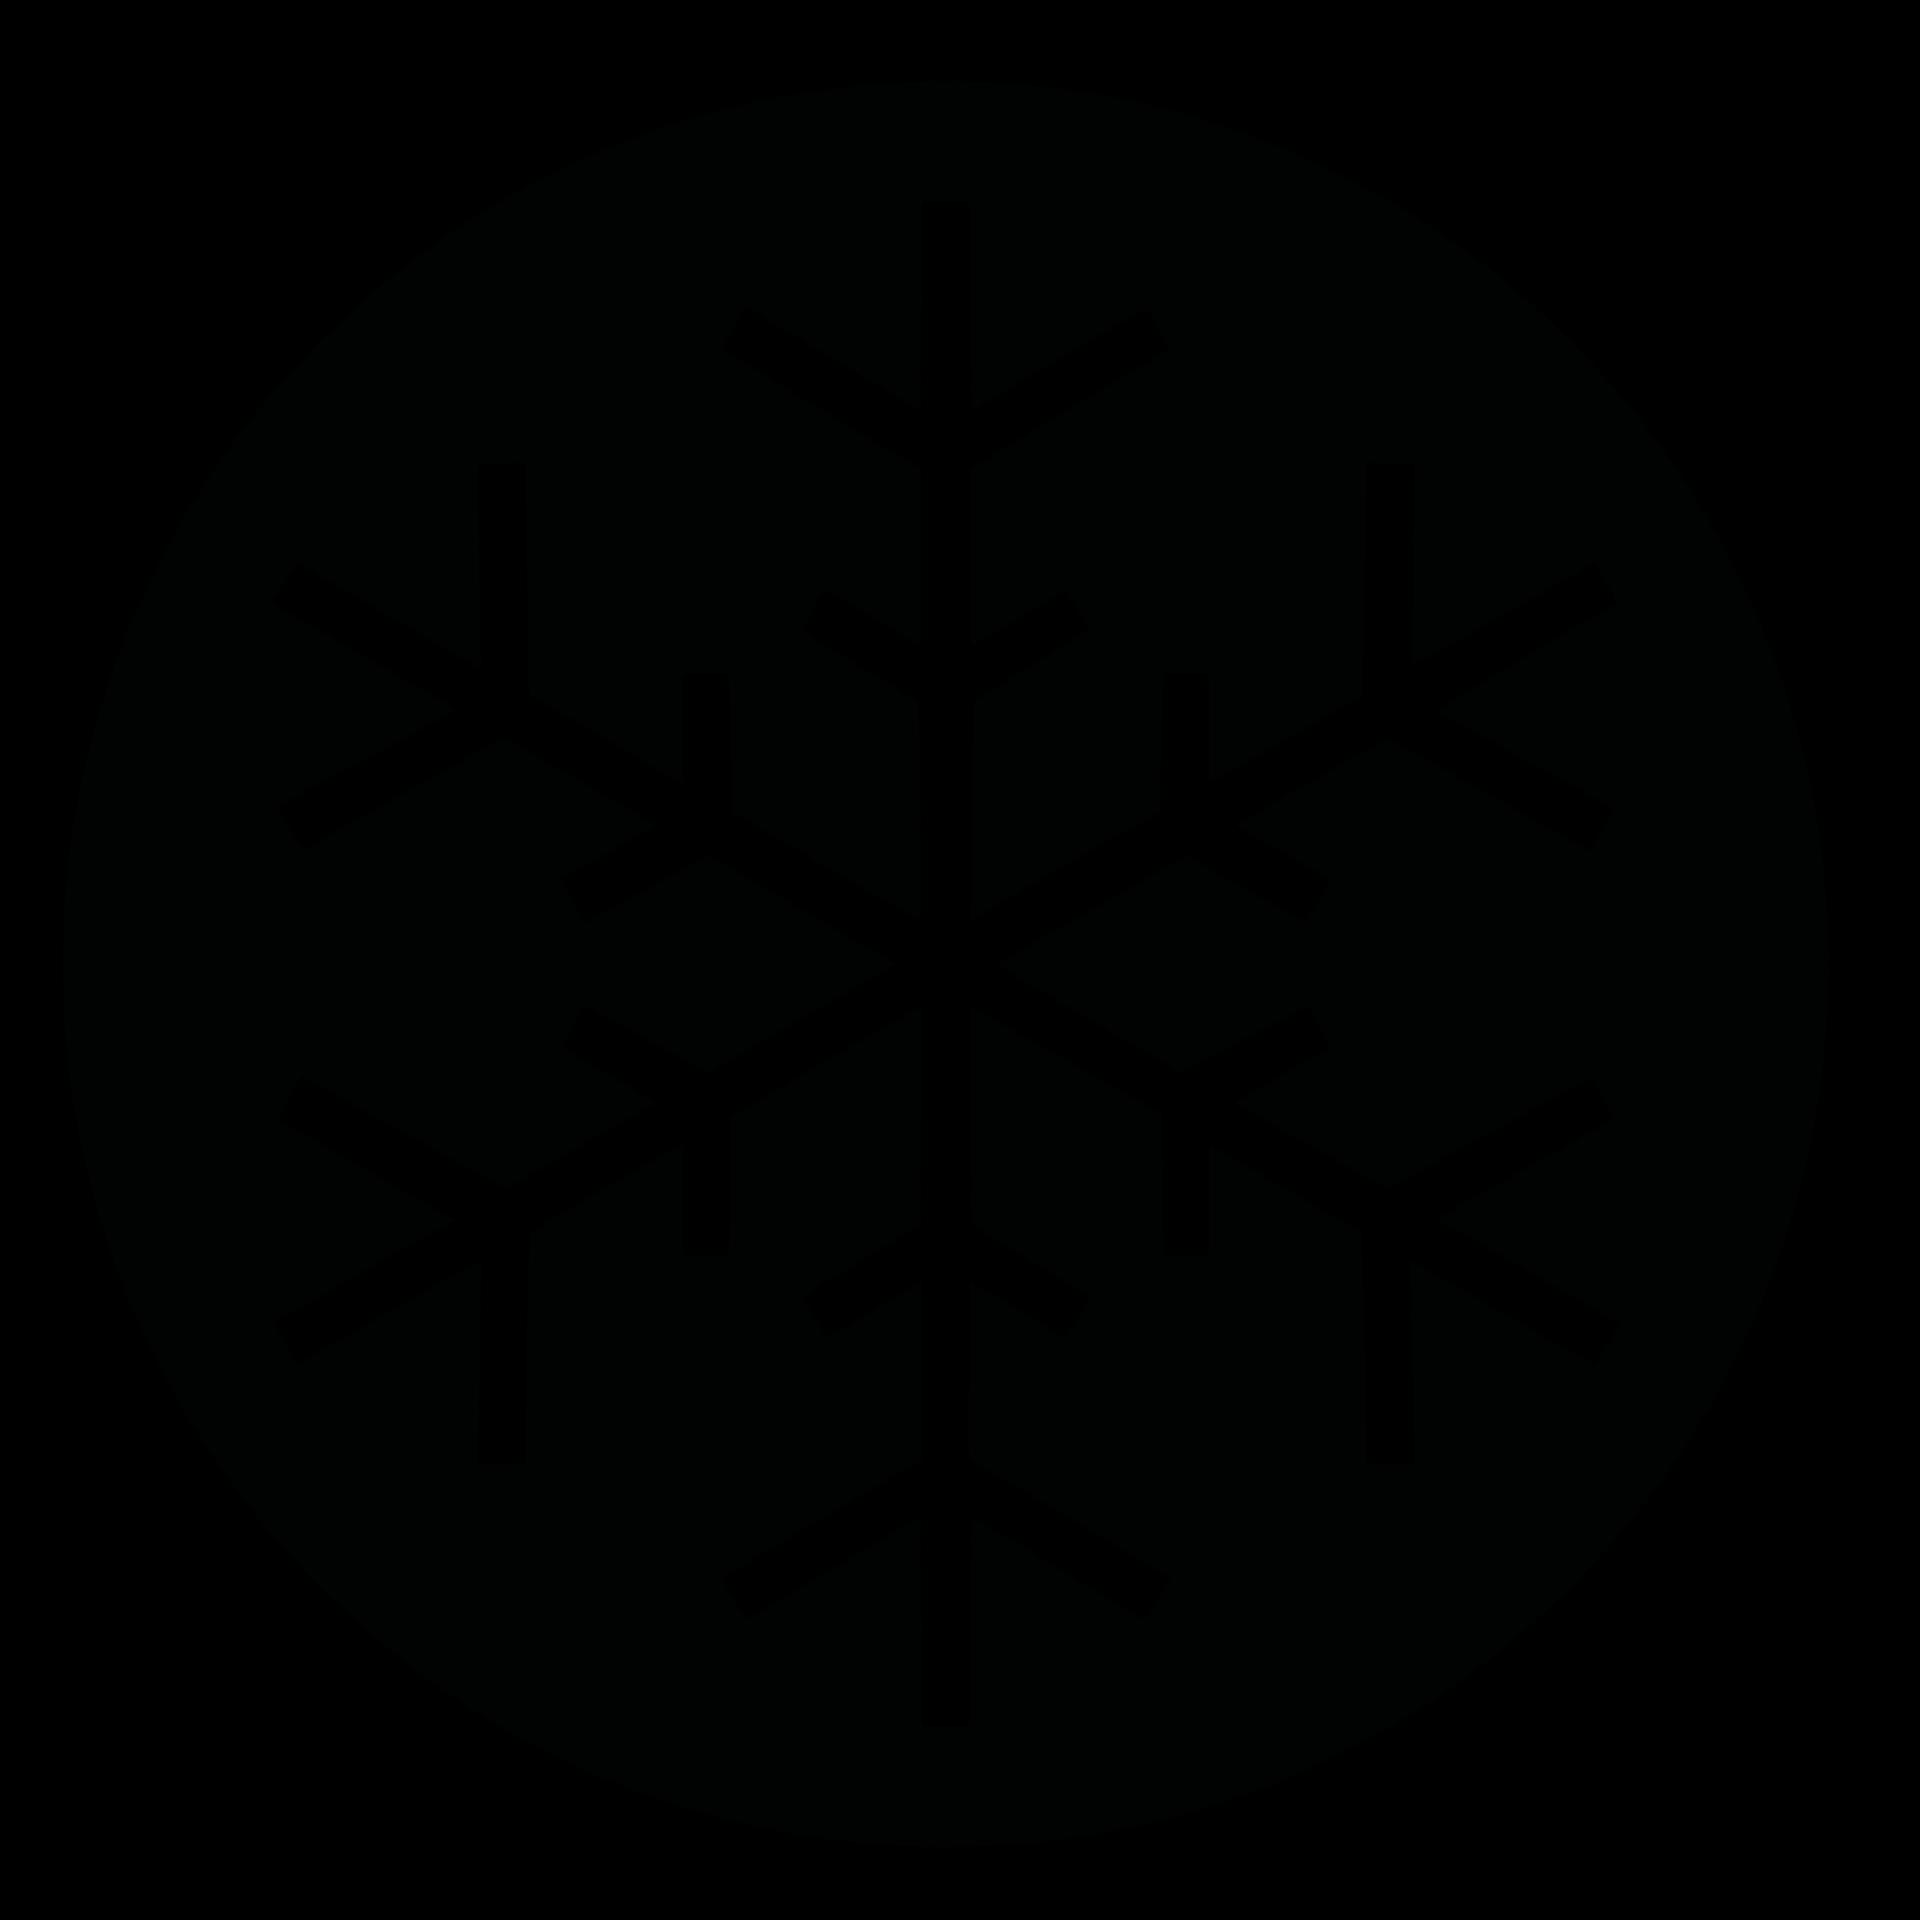 Snowflake_black